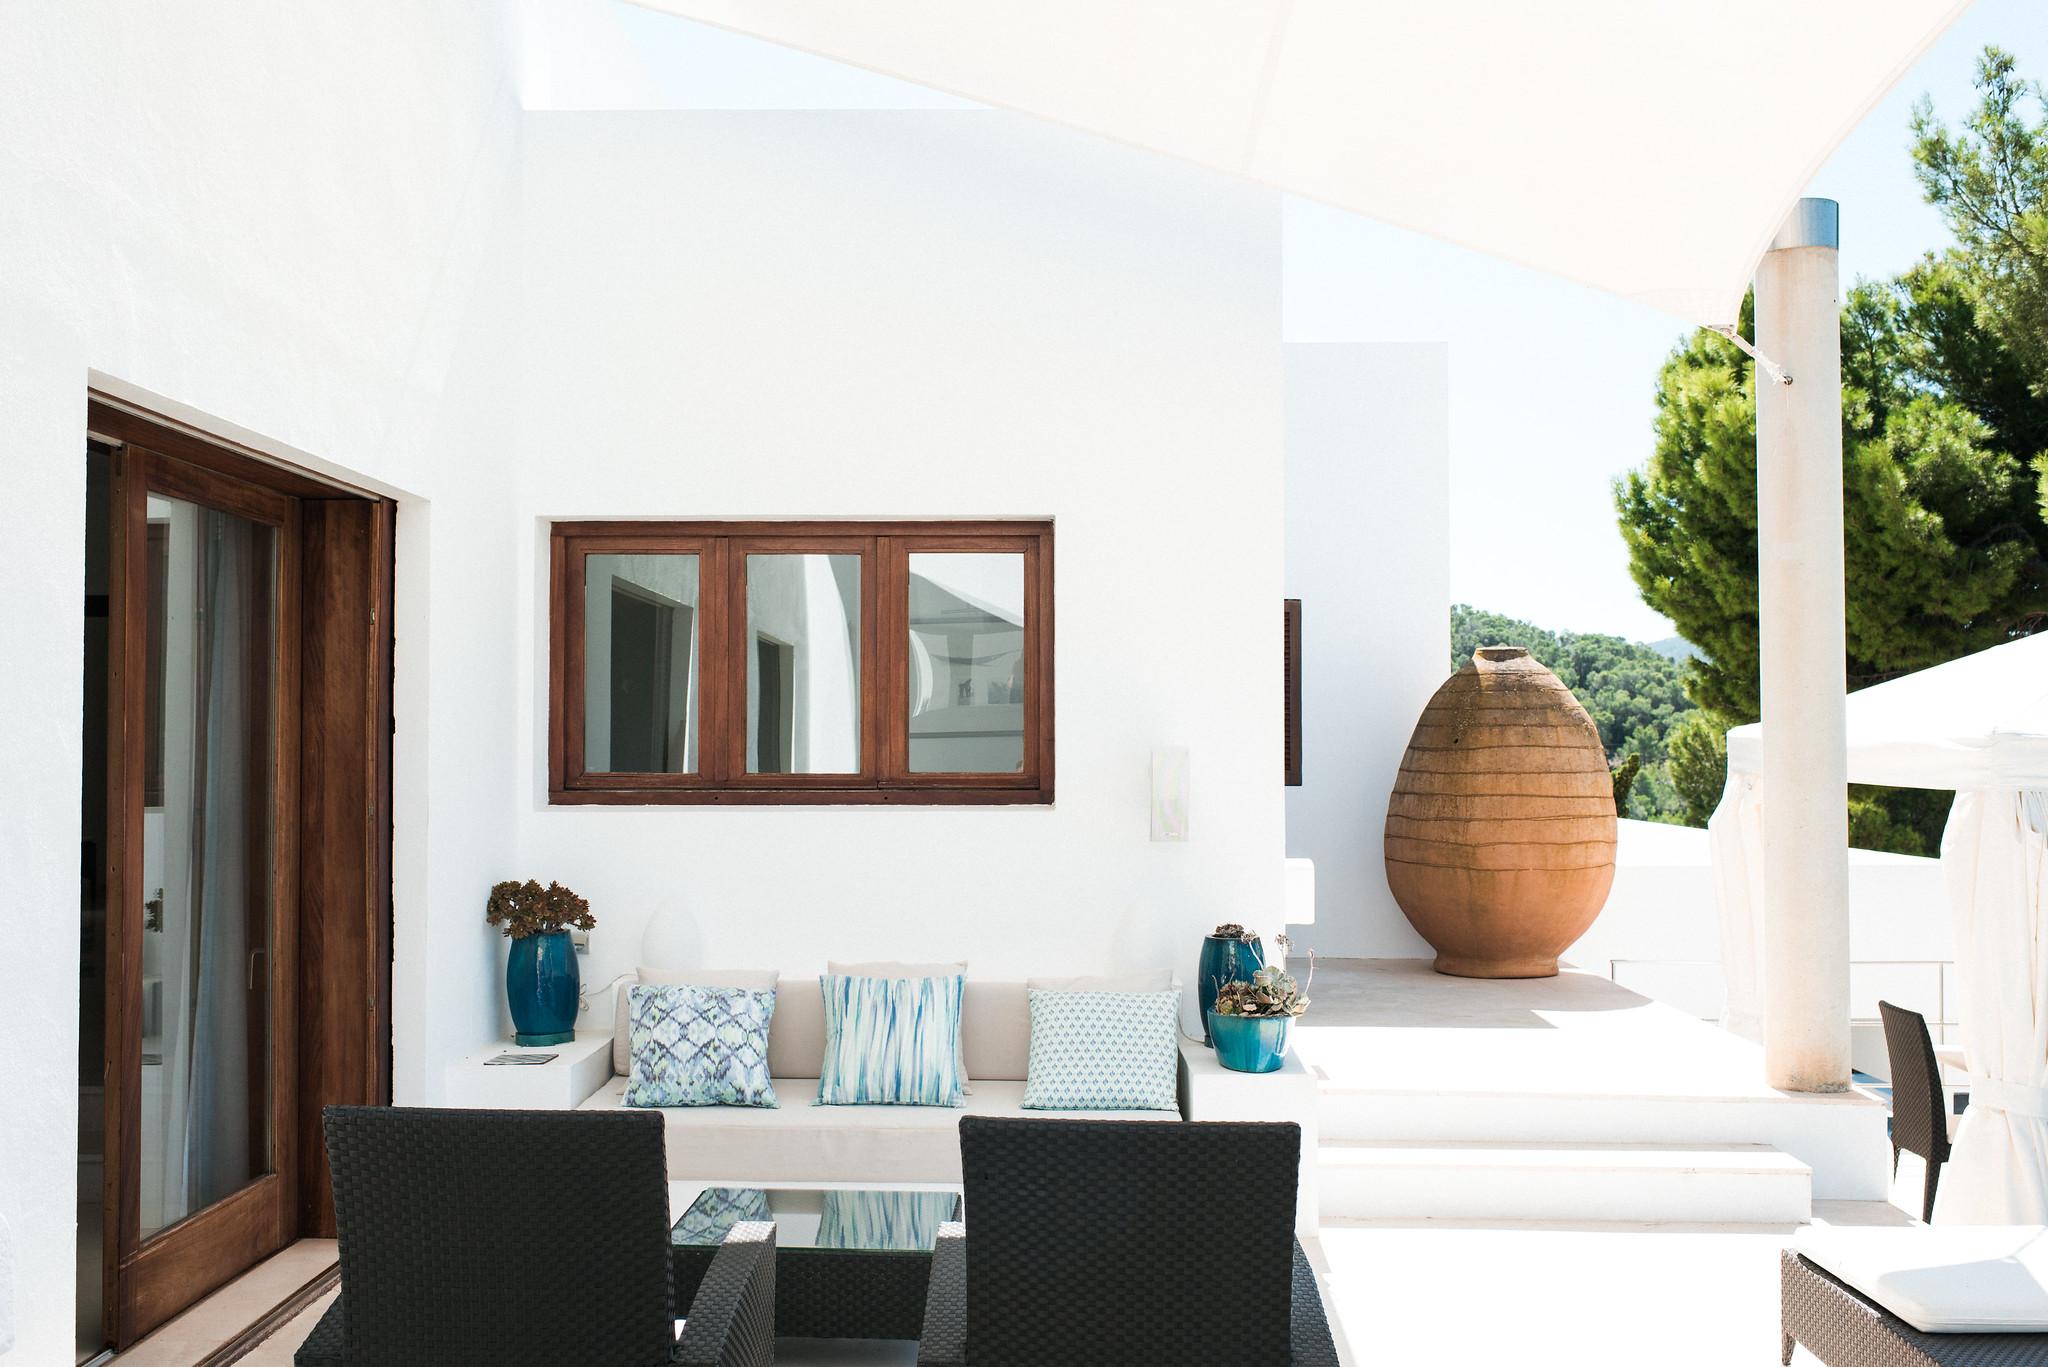 https://www.white-ibiza.com/wp-content/uploads/2020/05/white-ibiza-villas-can-ava-exterior.jpg